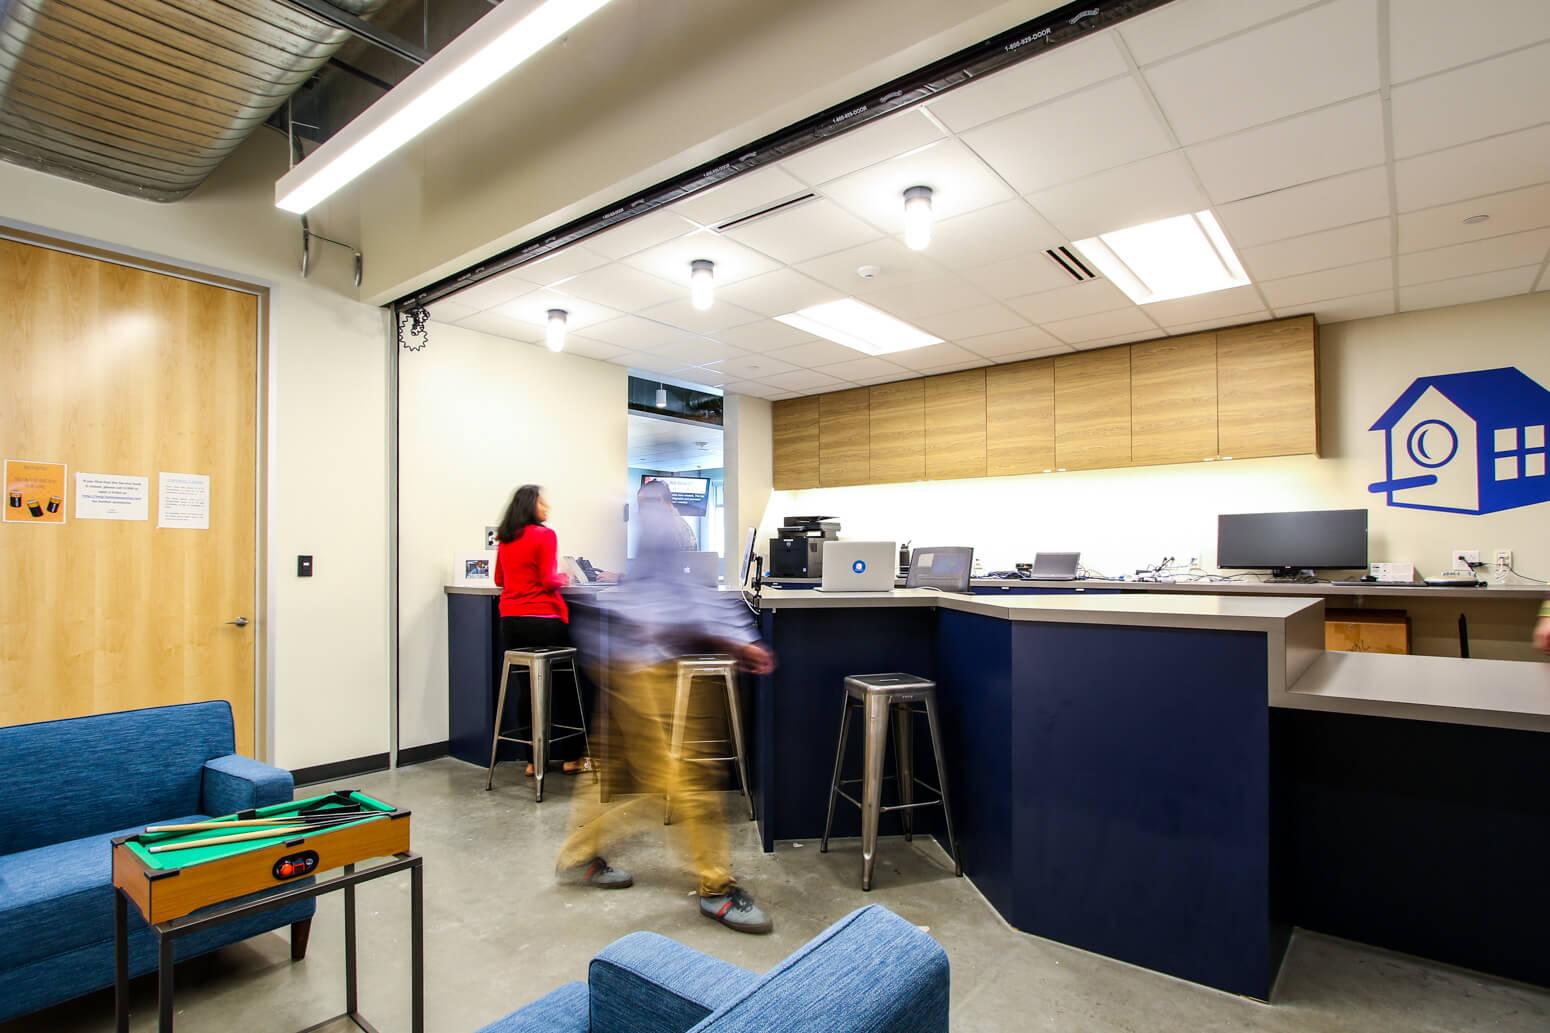 HomeAway Austin Office Killer Spaces-2